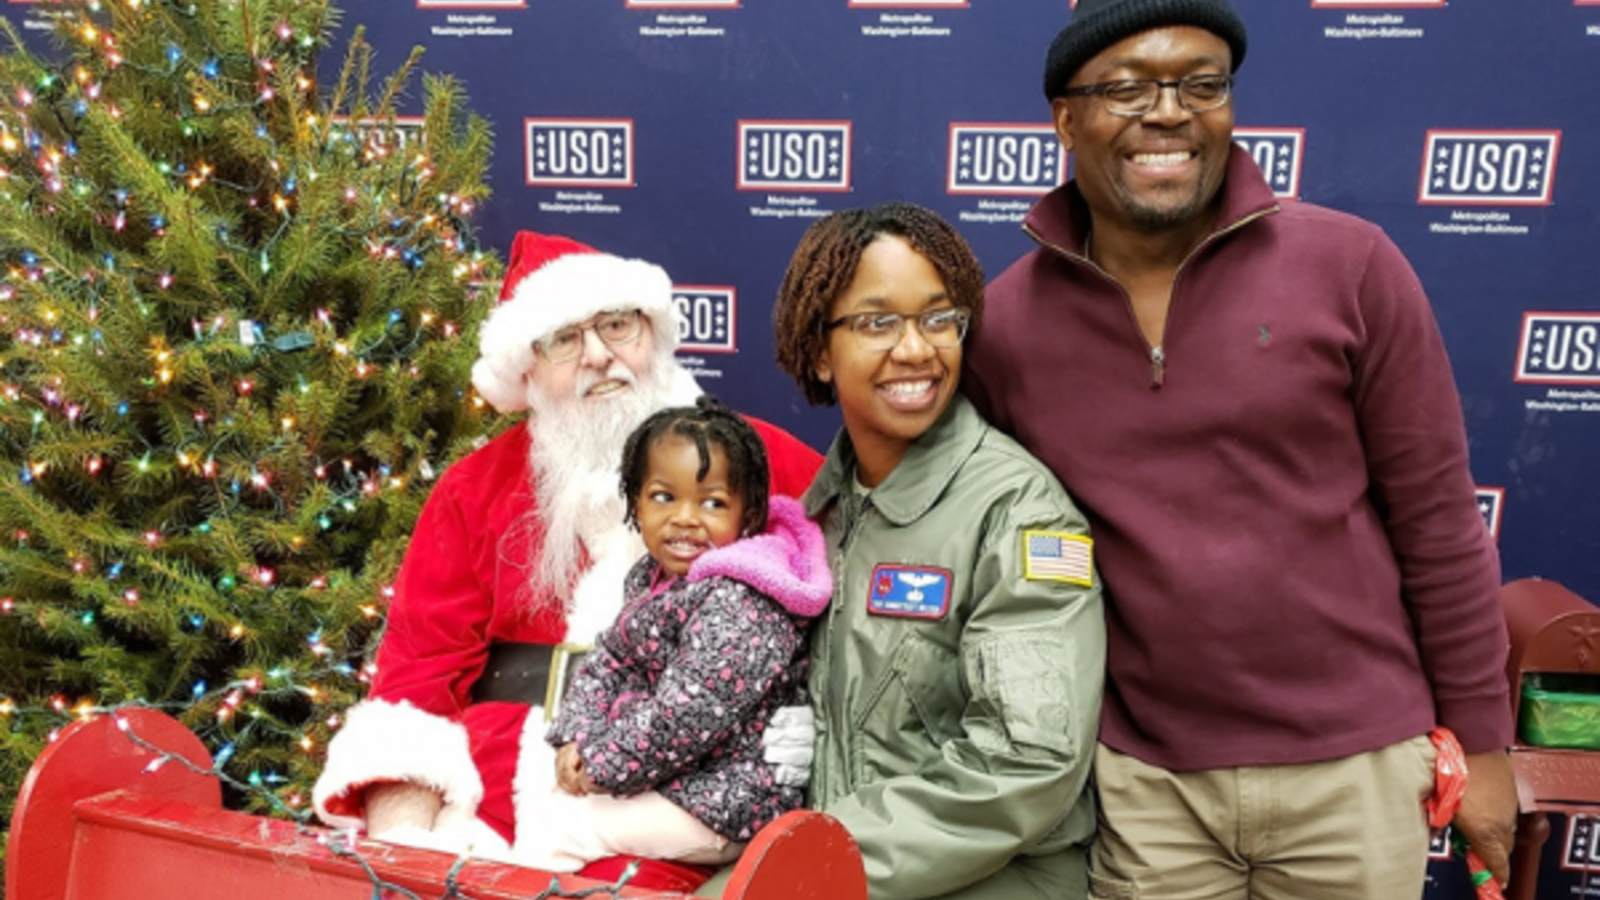 Baltimore Christmas Events 2020 USO Metro 2020 Holiday Programs • USO of Metropolitan Washington